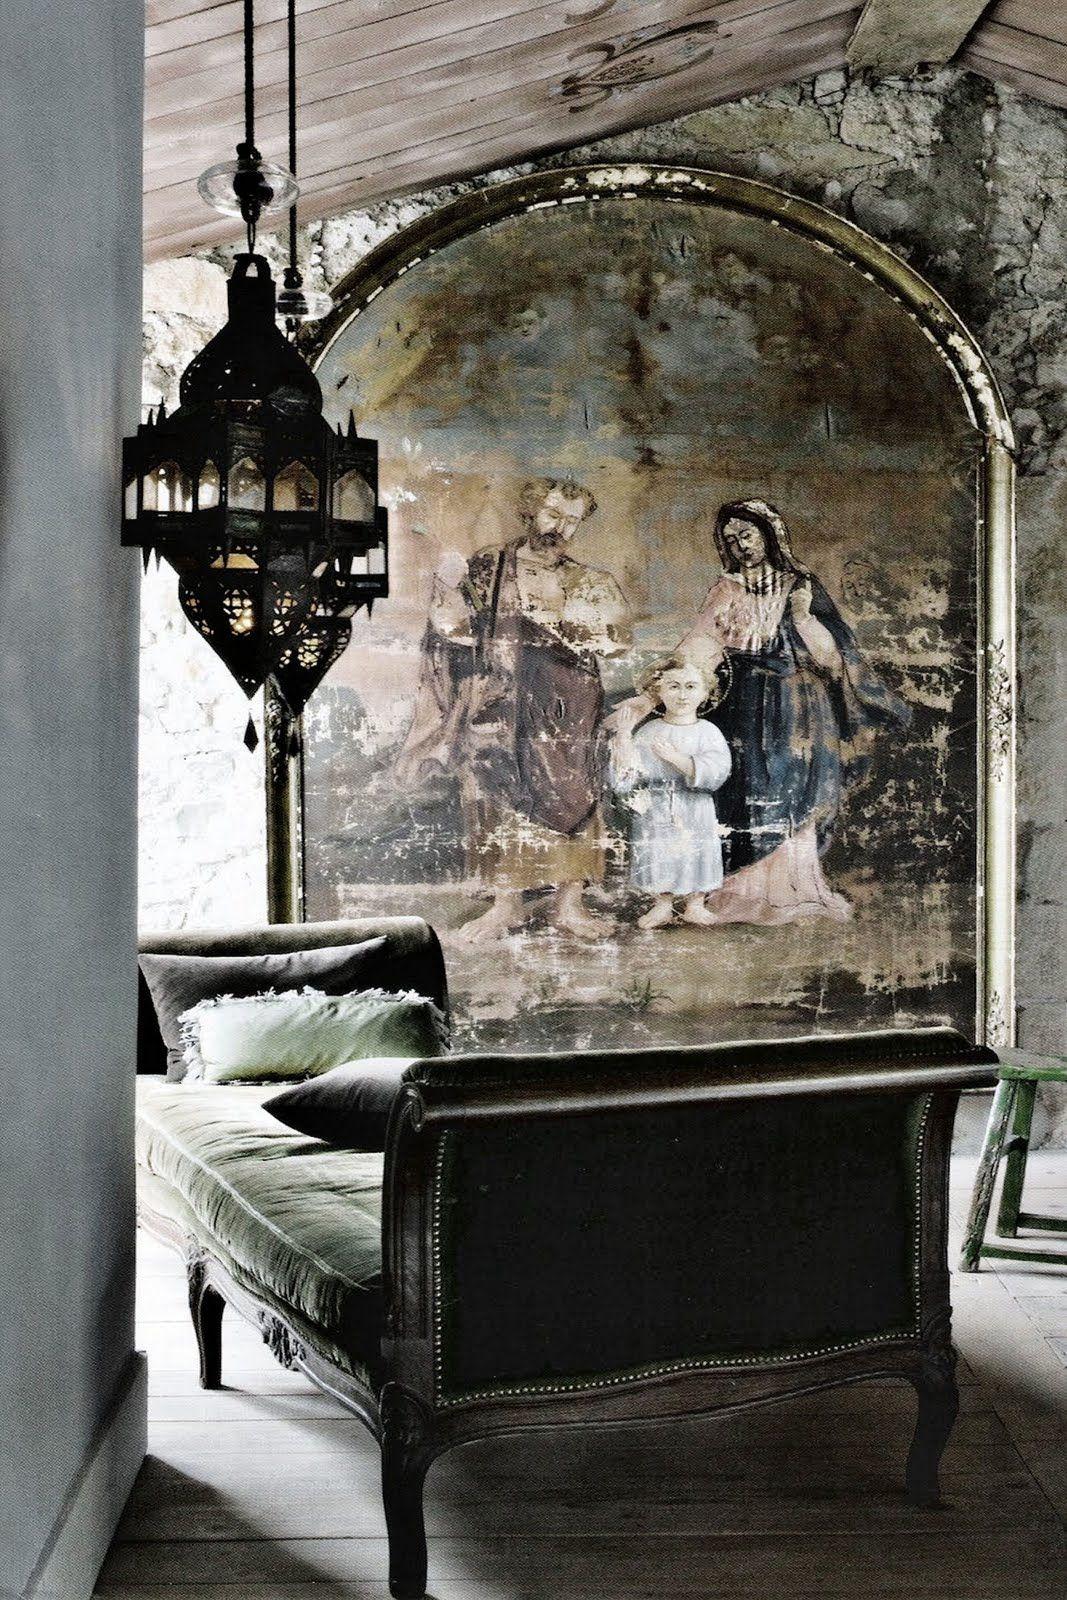 Brocade Home Decor halloween decor ideas  gothic elegance home decorating | vintage